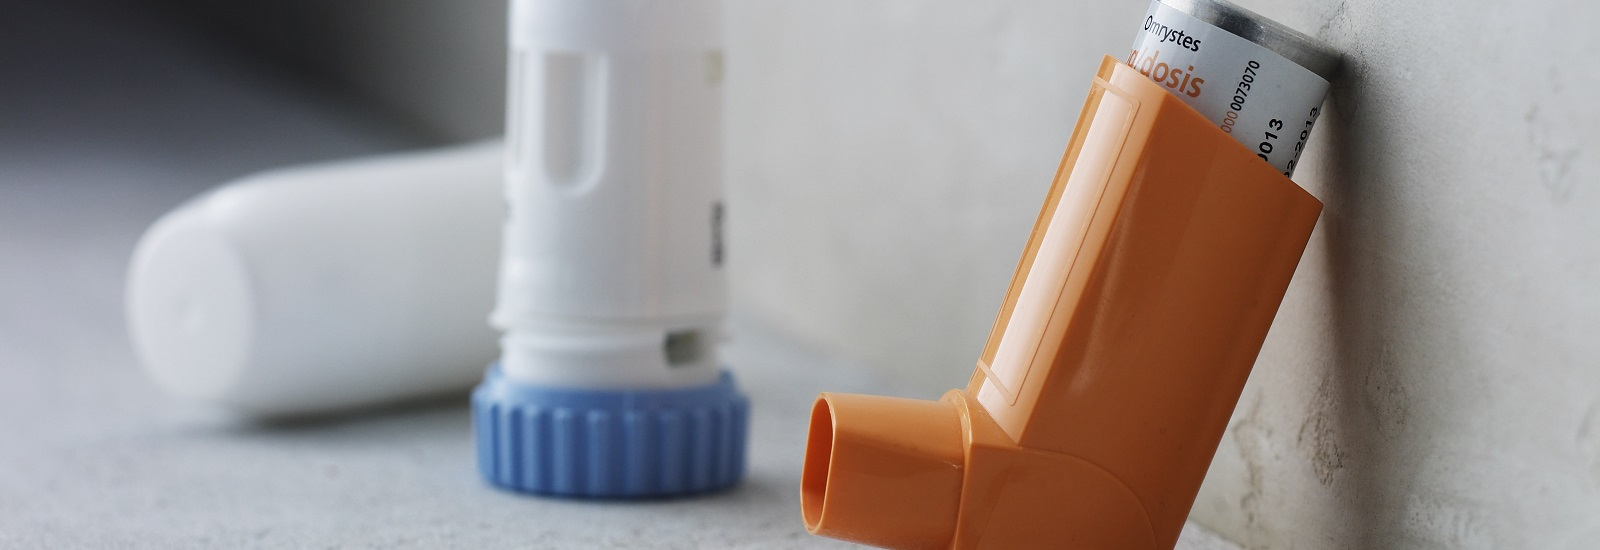 astmatisk bronkitis smitte